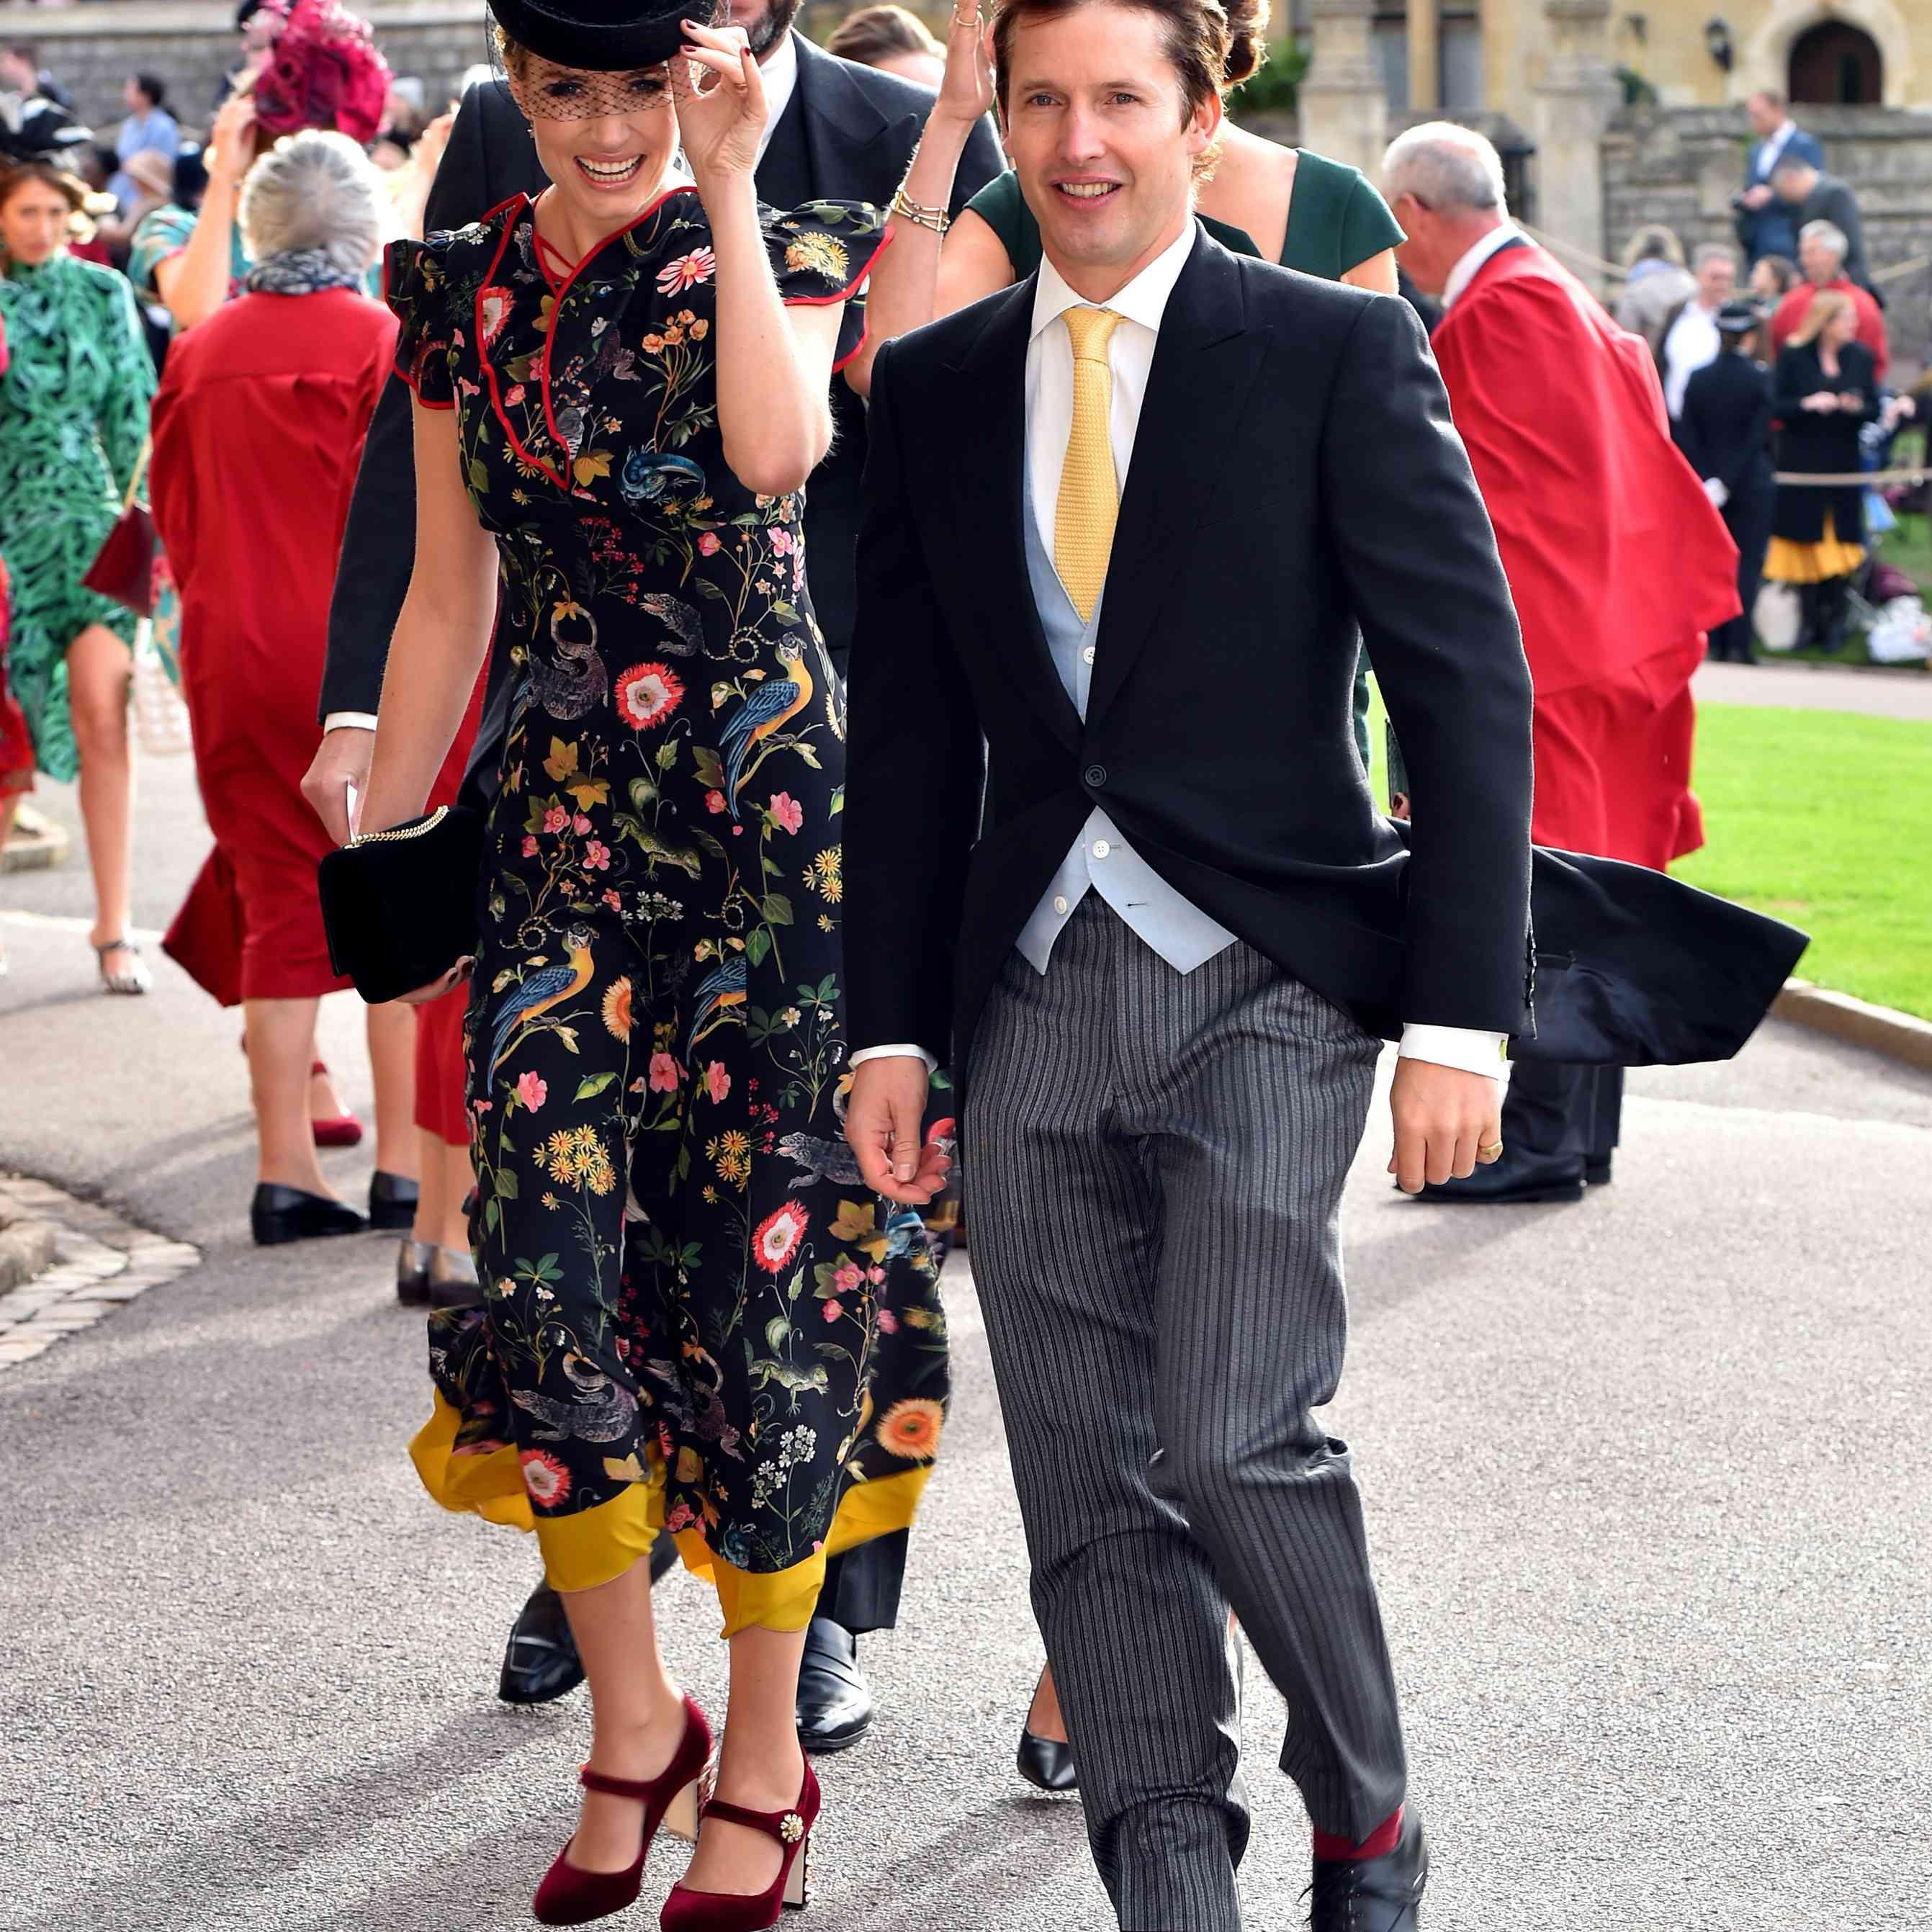 Story Comedian Iliza Shlesinger Wedding: Royal Wedding Guests: Princess Eugenie And Jack Brooksbank